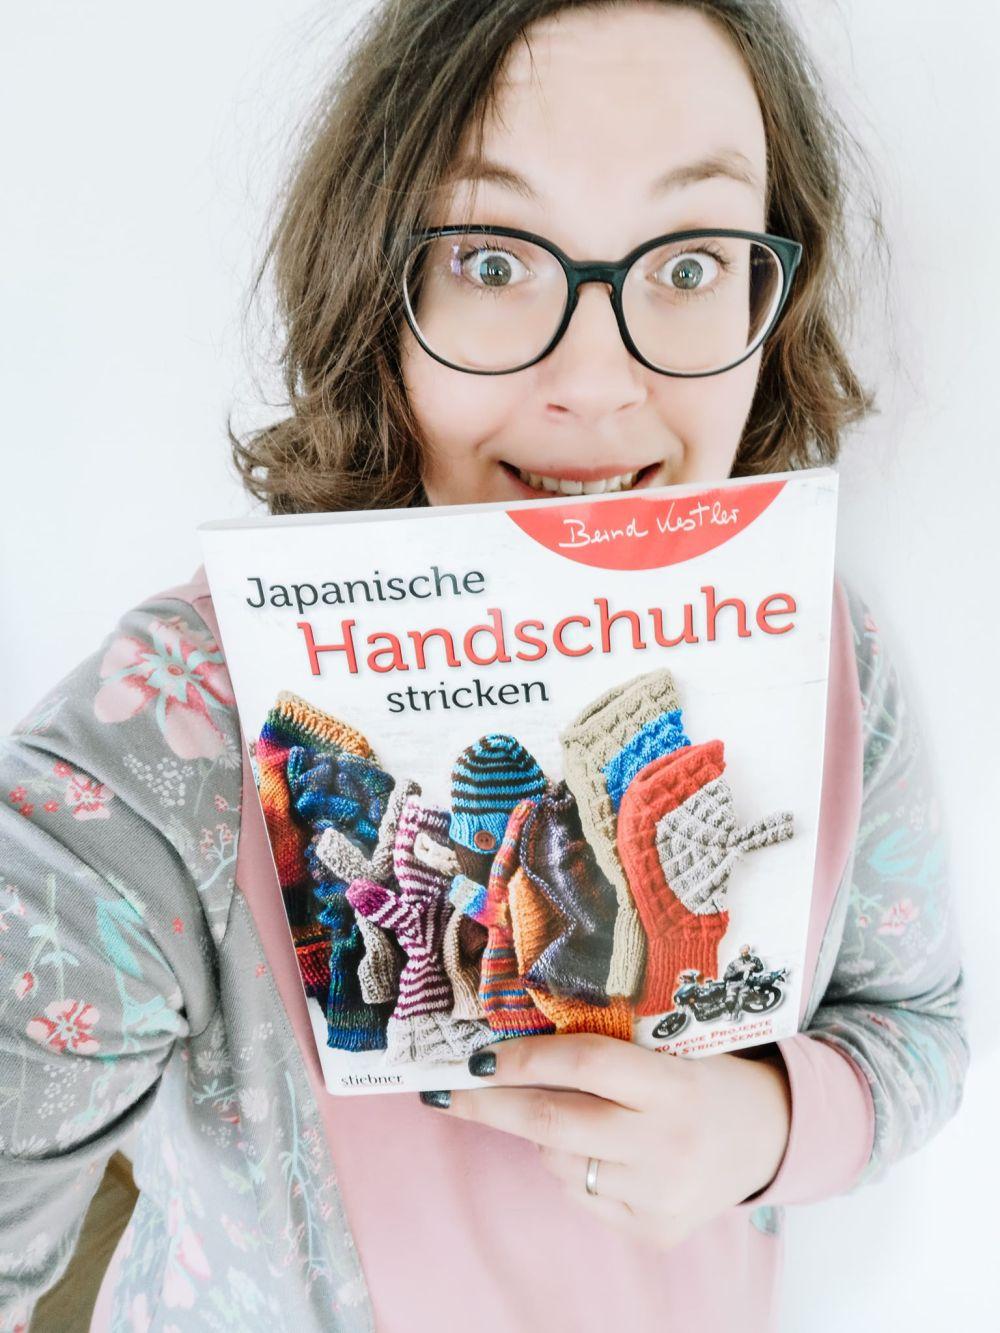 Rezension Bernd Kestler Handschuhe stricken (1)